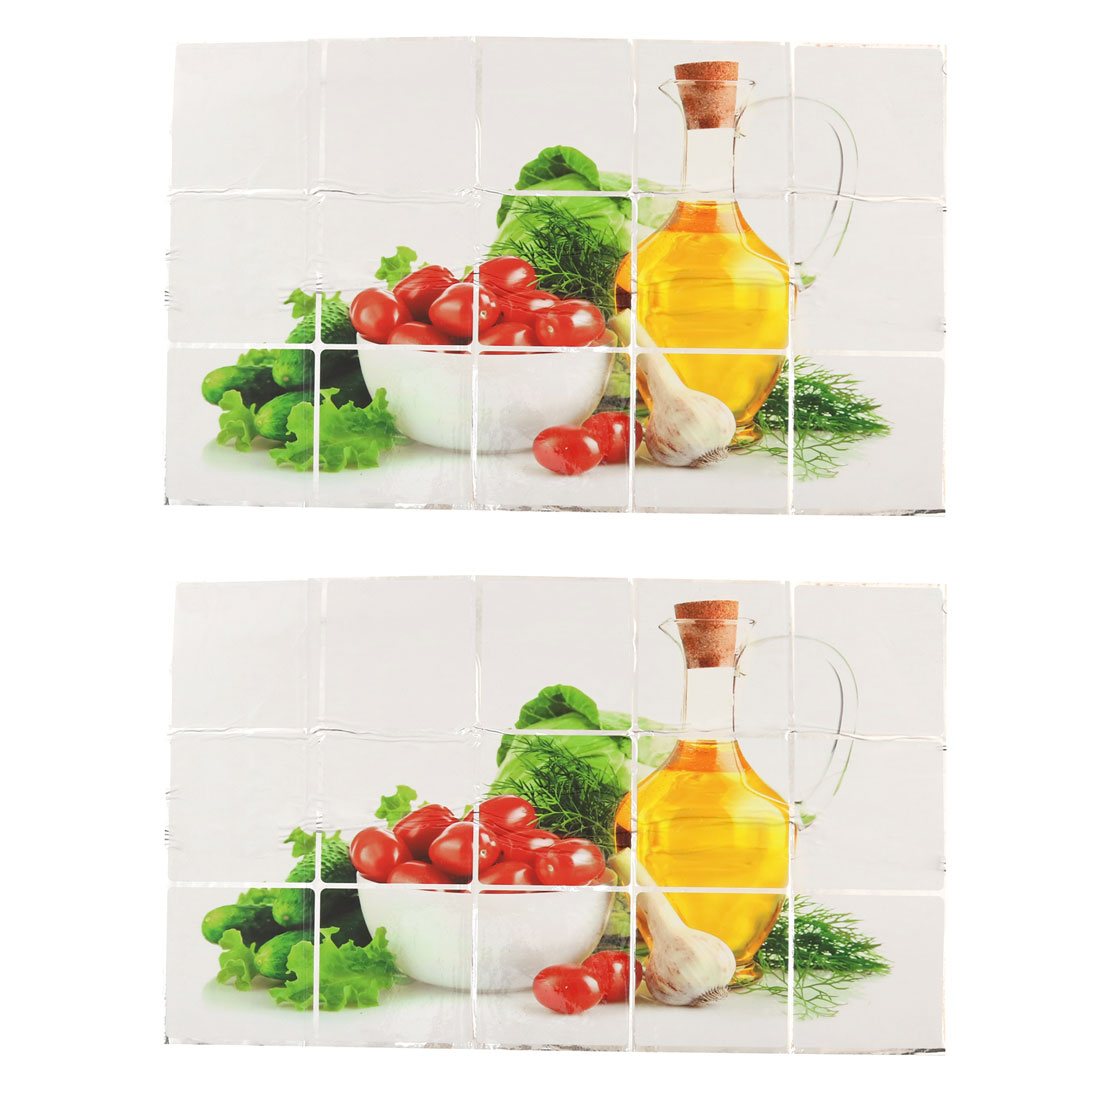 PVC Fruit Pattern Self-adhesive Oil Proof Wall Window Sticker 75 x 45cm 2pcs